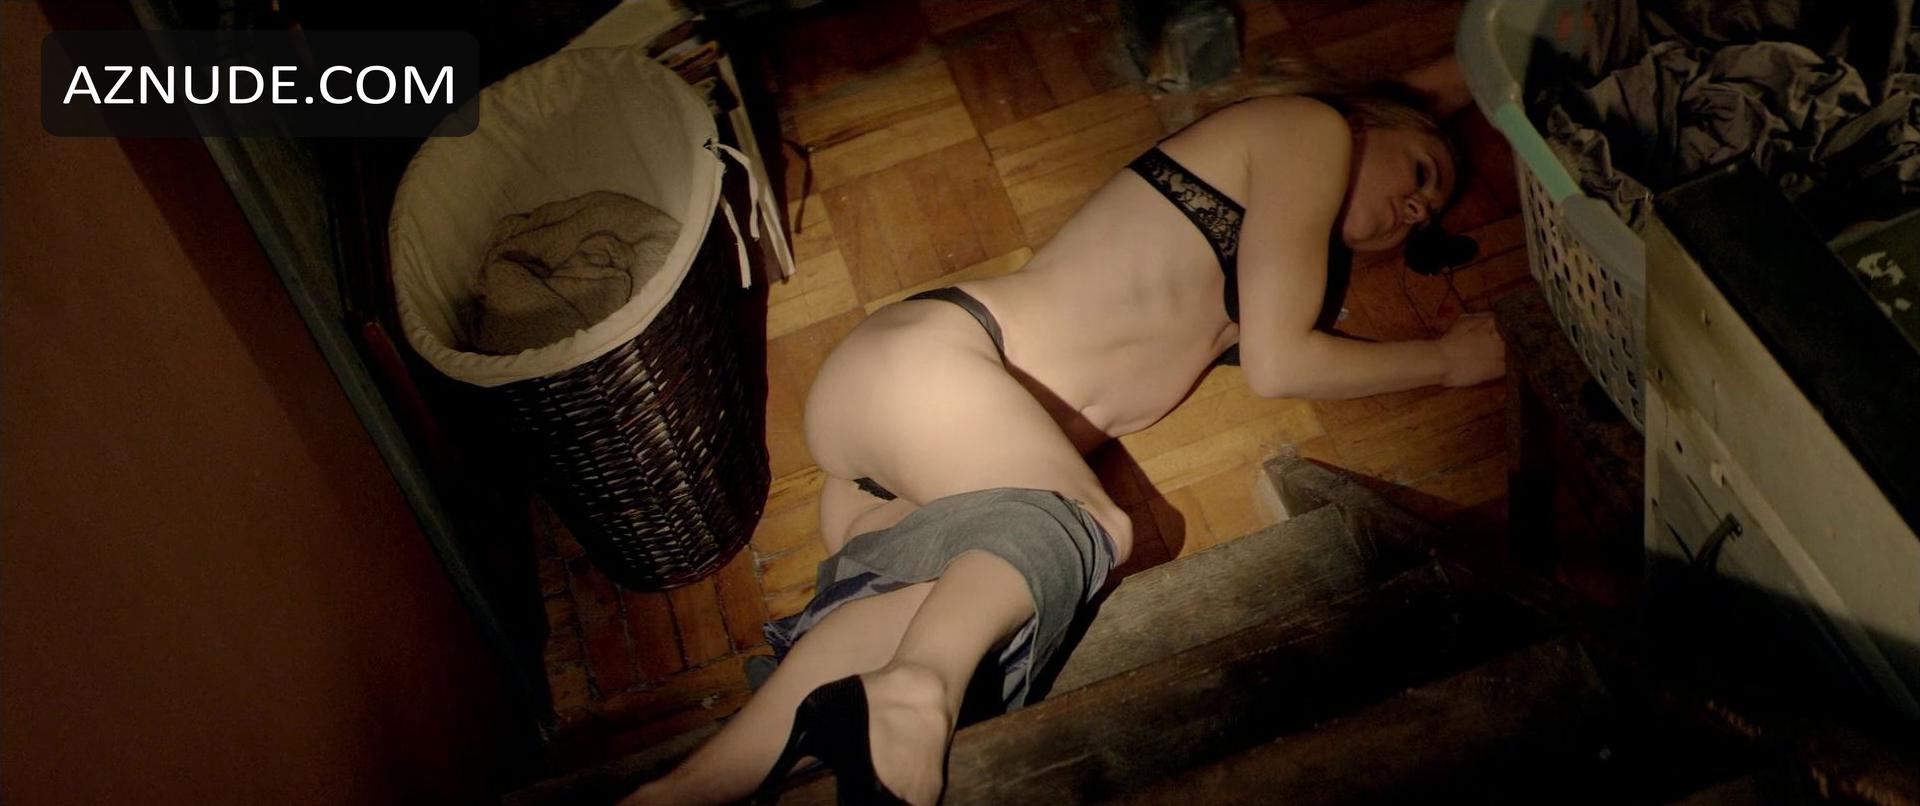 Nude sex in dark room opinion you